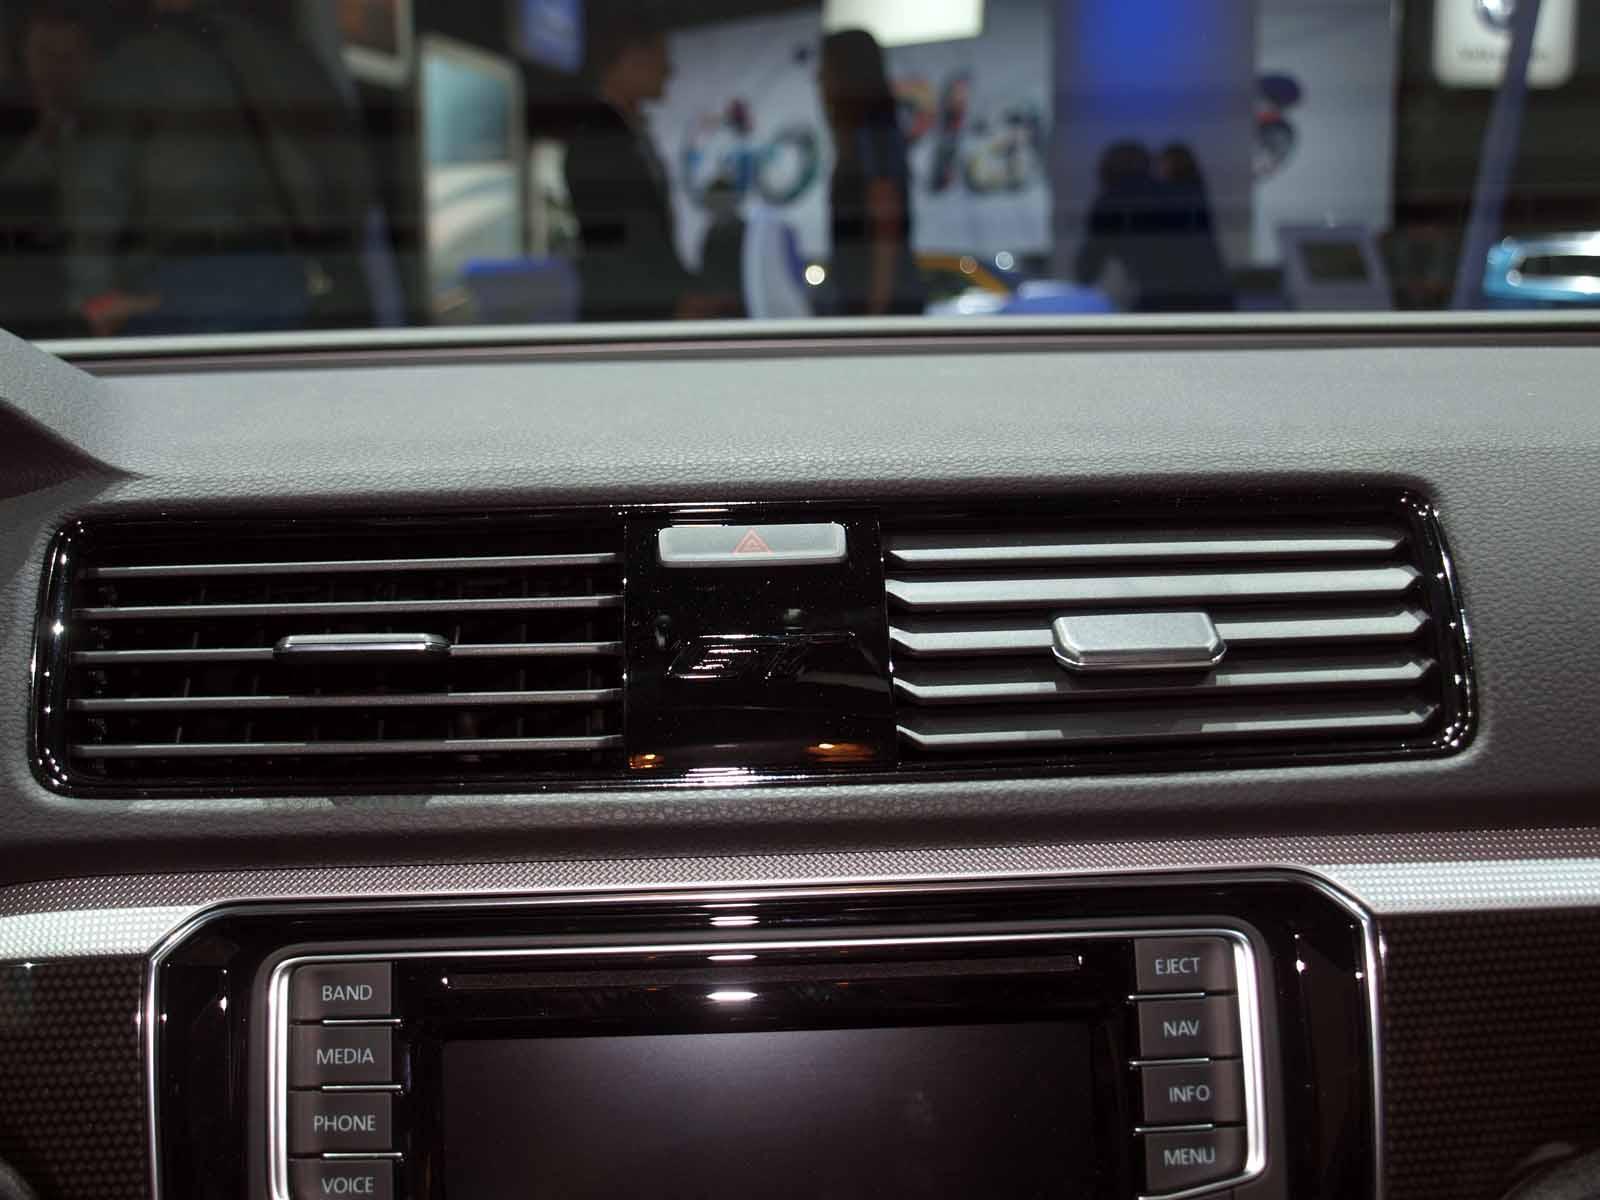 2017 Audi A4 vs 2017 BMW 330i 004 JY 1200x550 photo